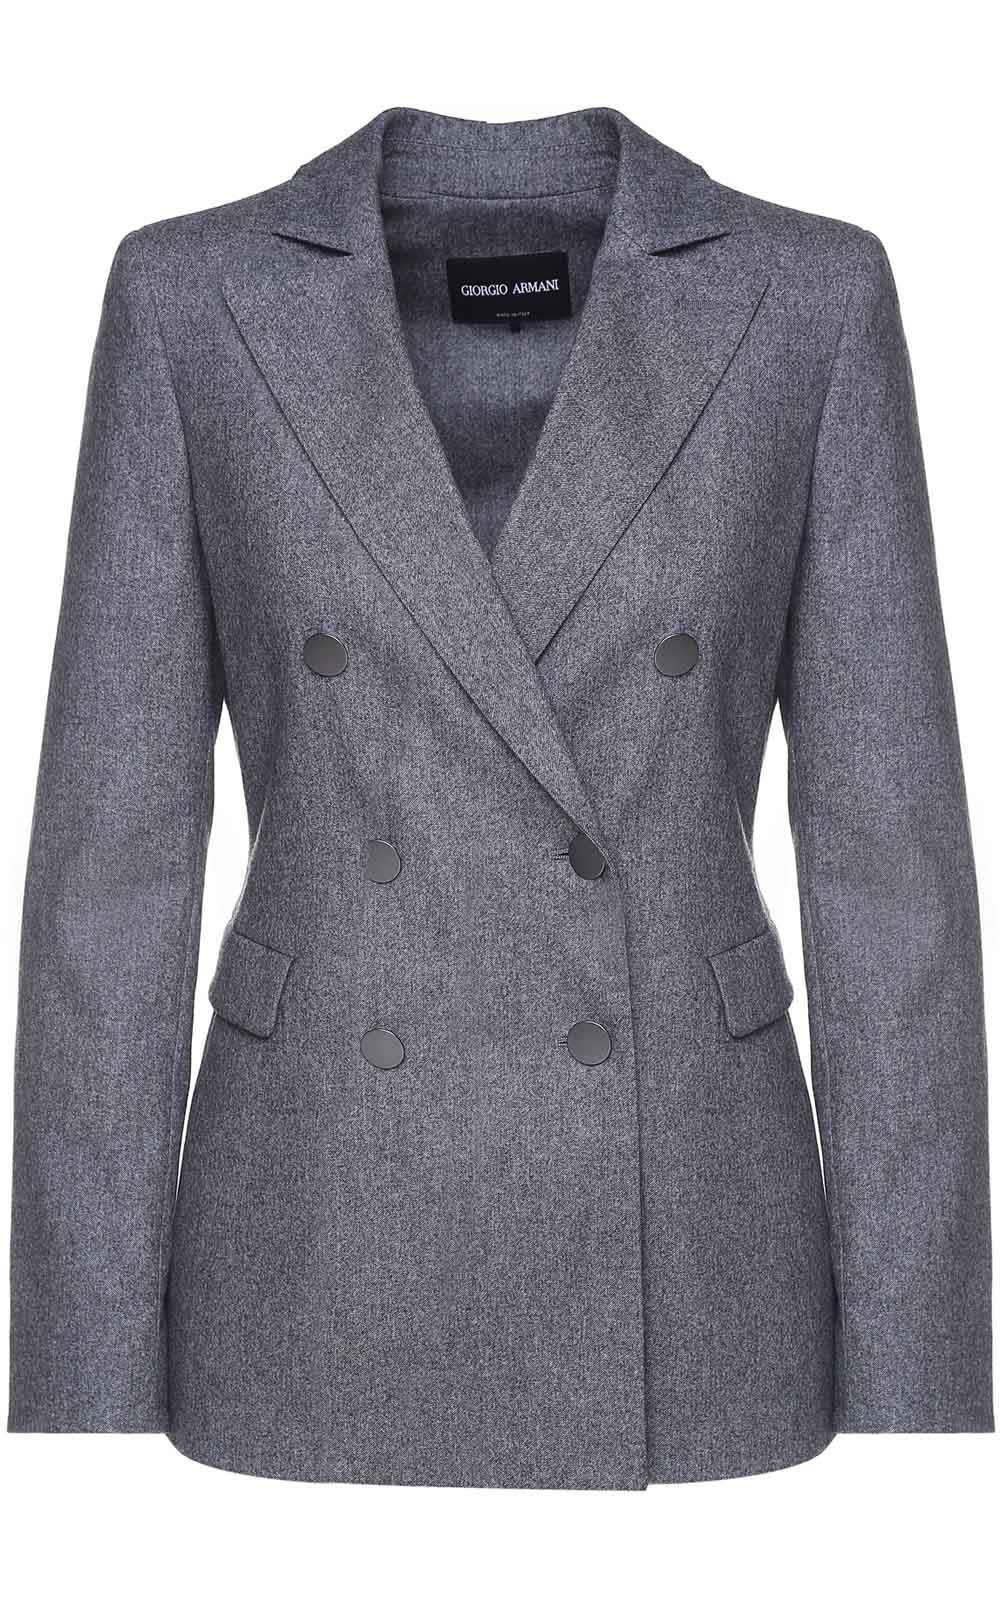 Giorgio Armani Double-breasted Cotton Cashmere And Wool-blend Blazer